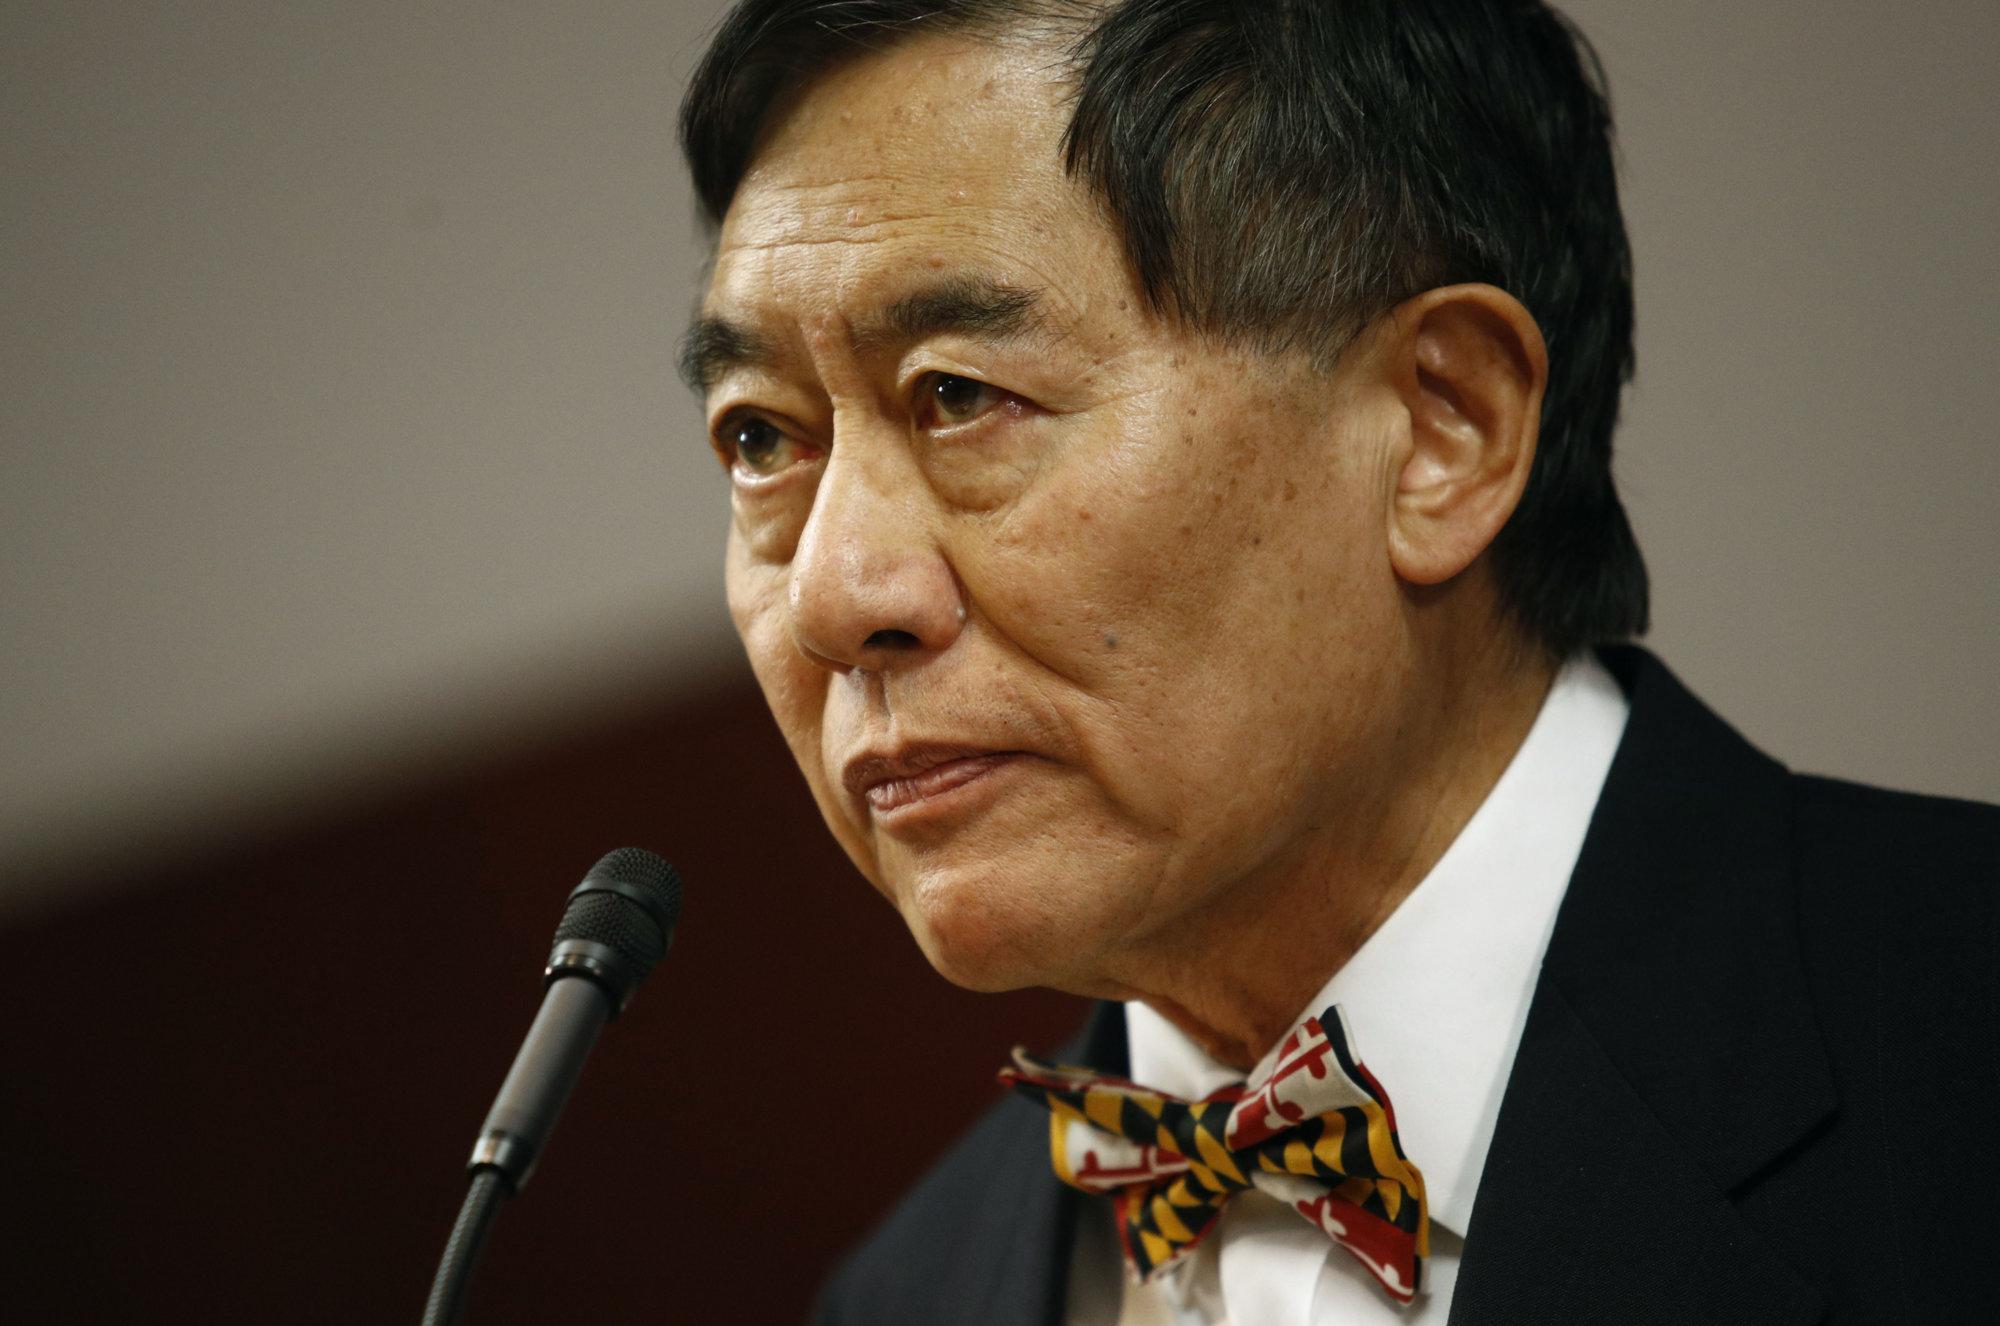 U.Md. President Loh to delay retirement until 2020